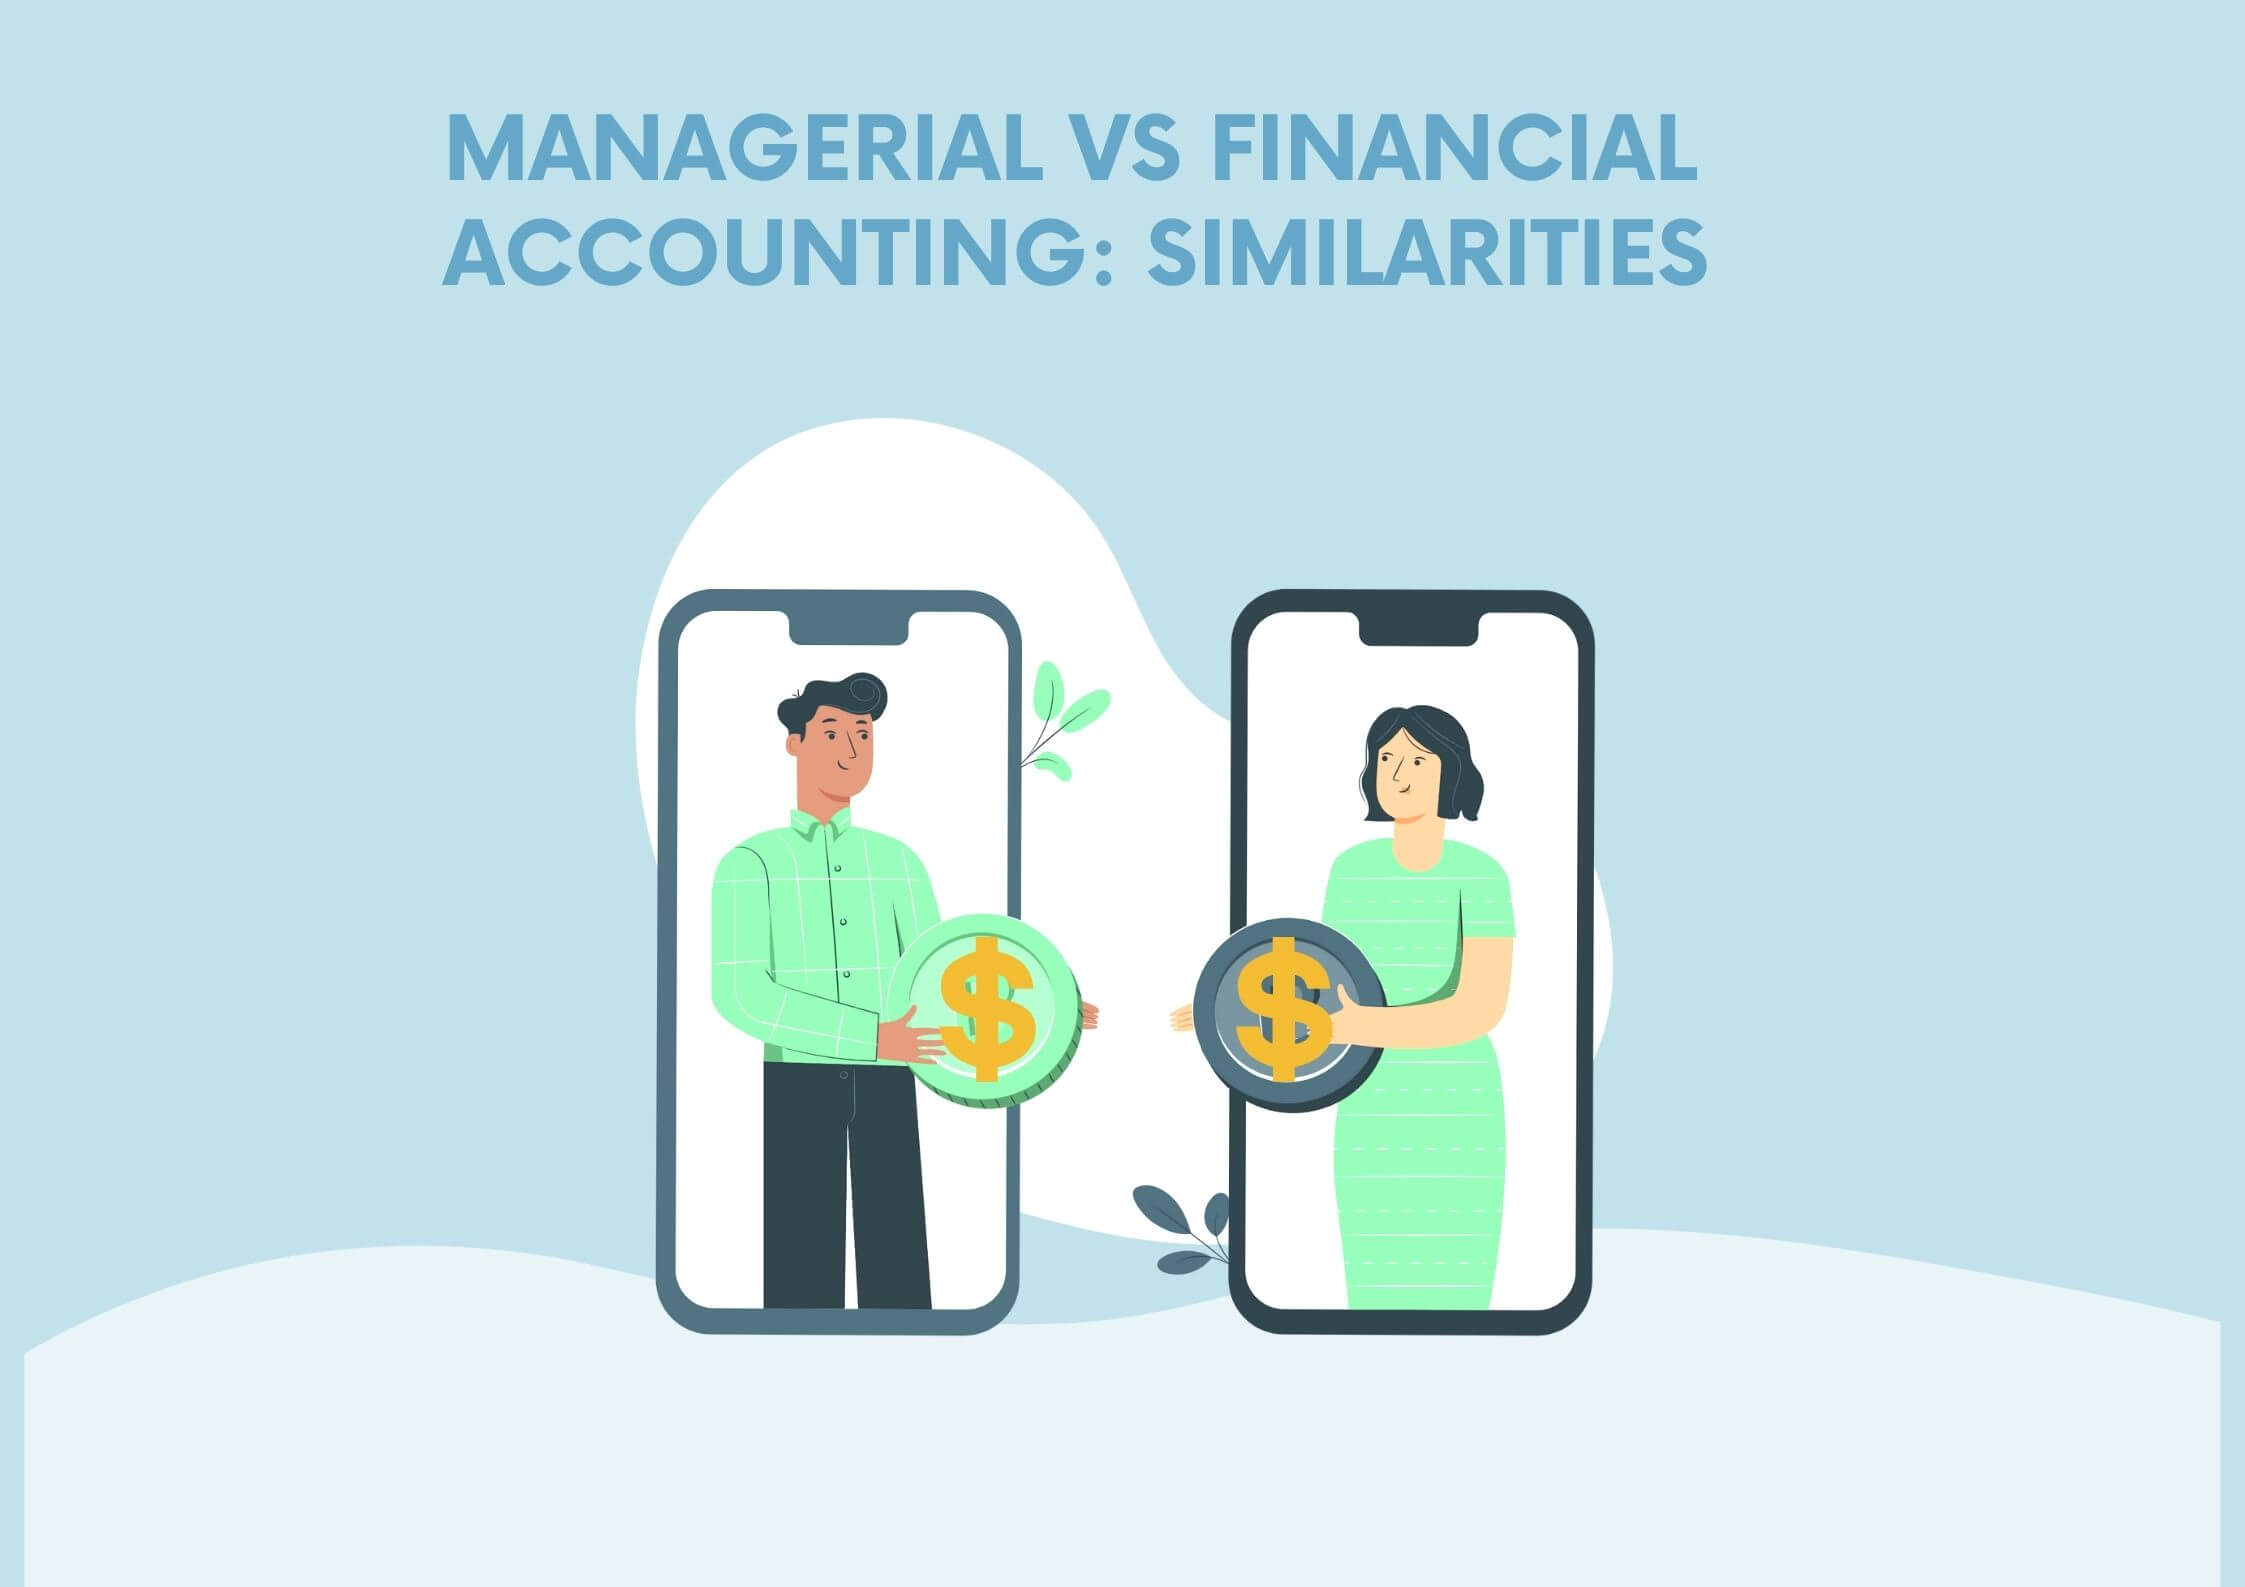 Managerial vs Financial Accounting: Similarities between them